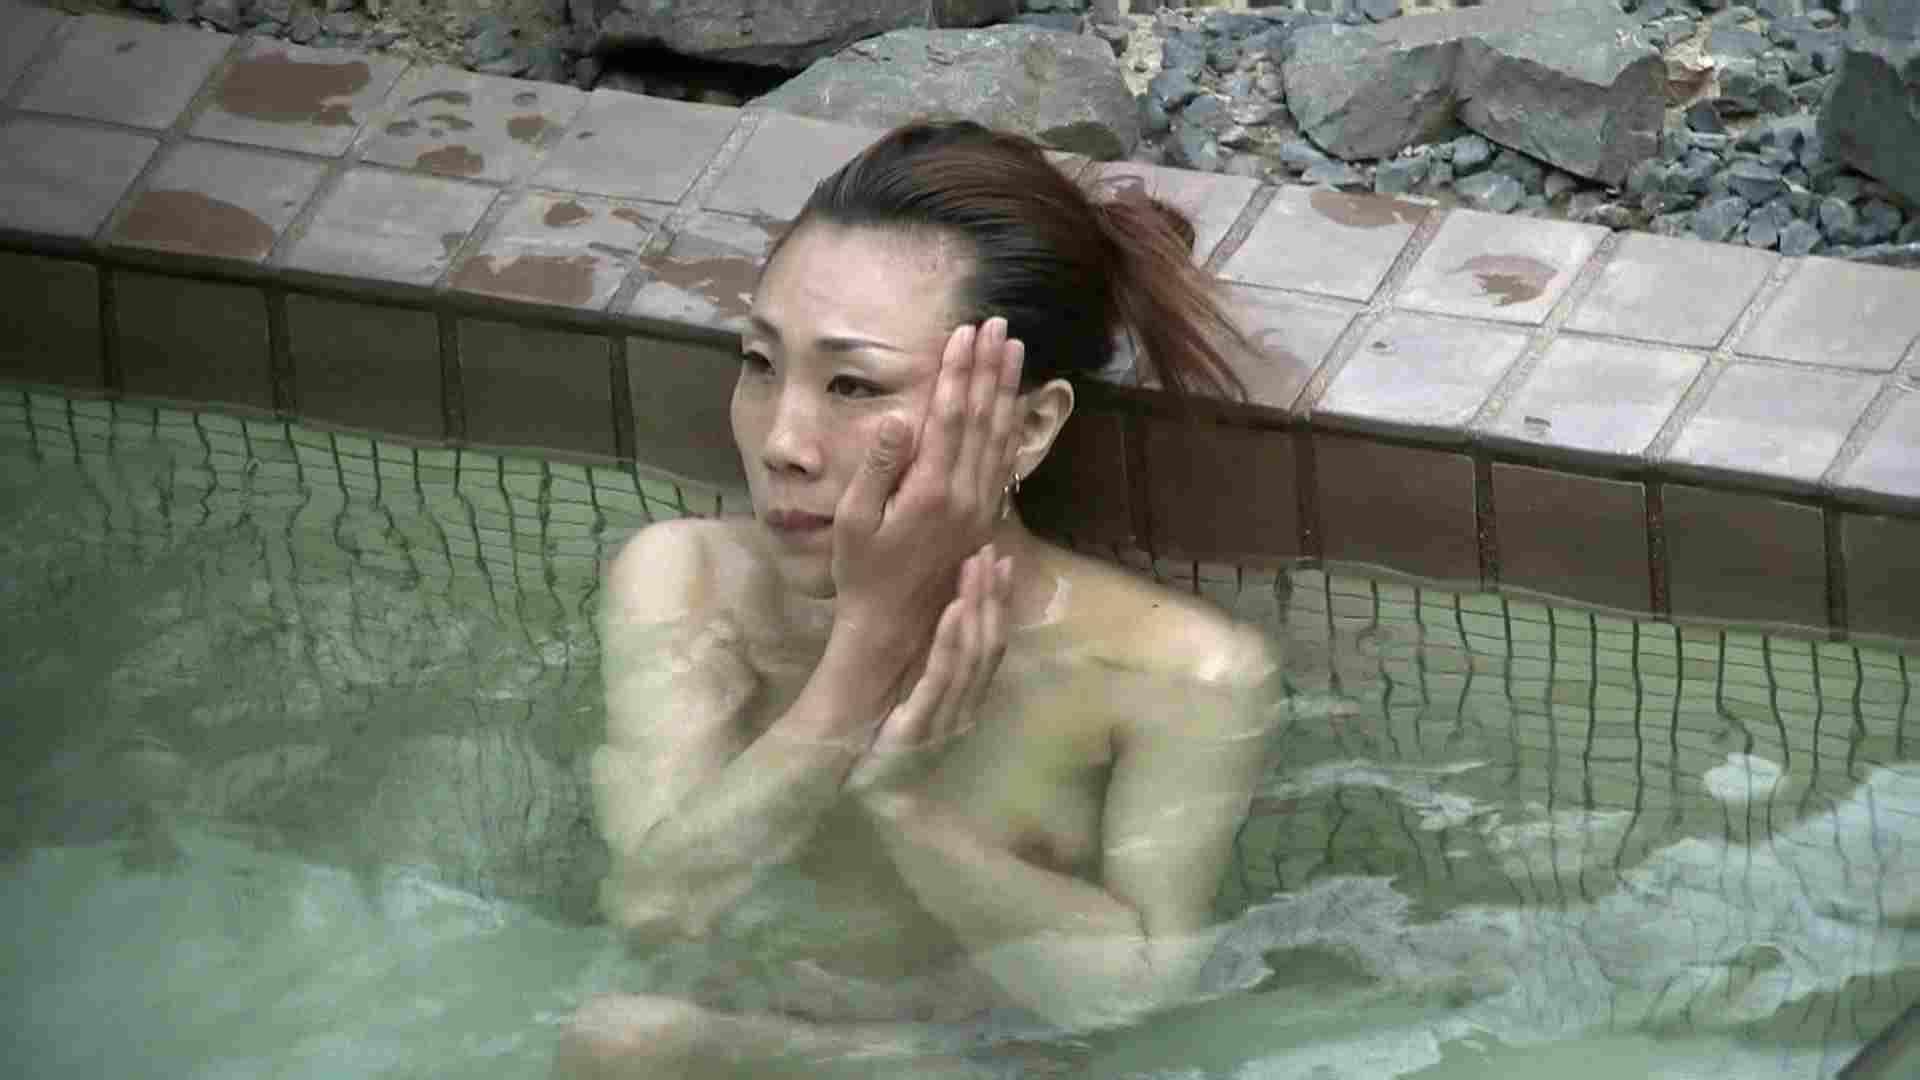 Aquaな露天風呂Vol.654 OLすけべ画像   盗撮  38連発 25